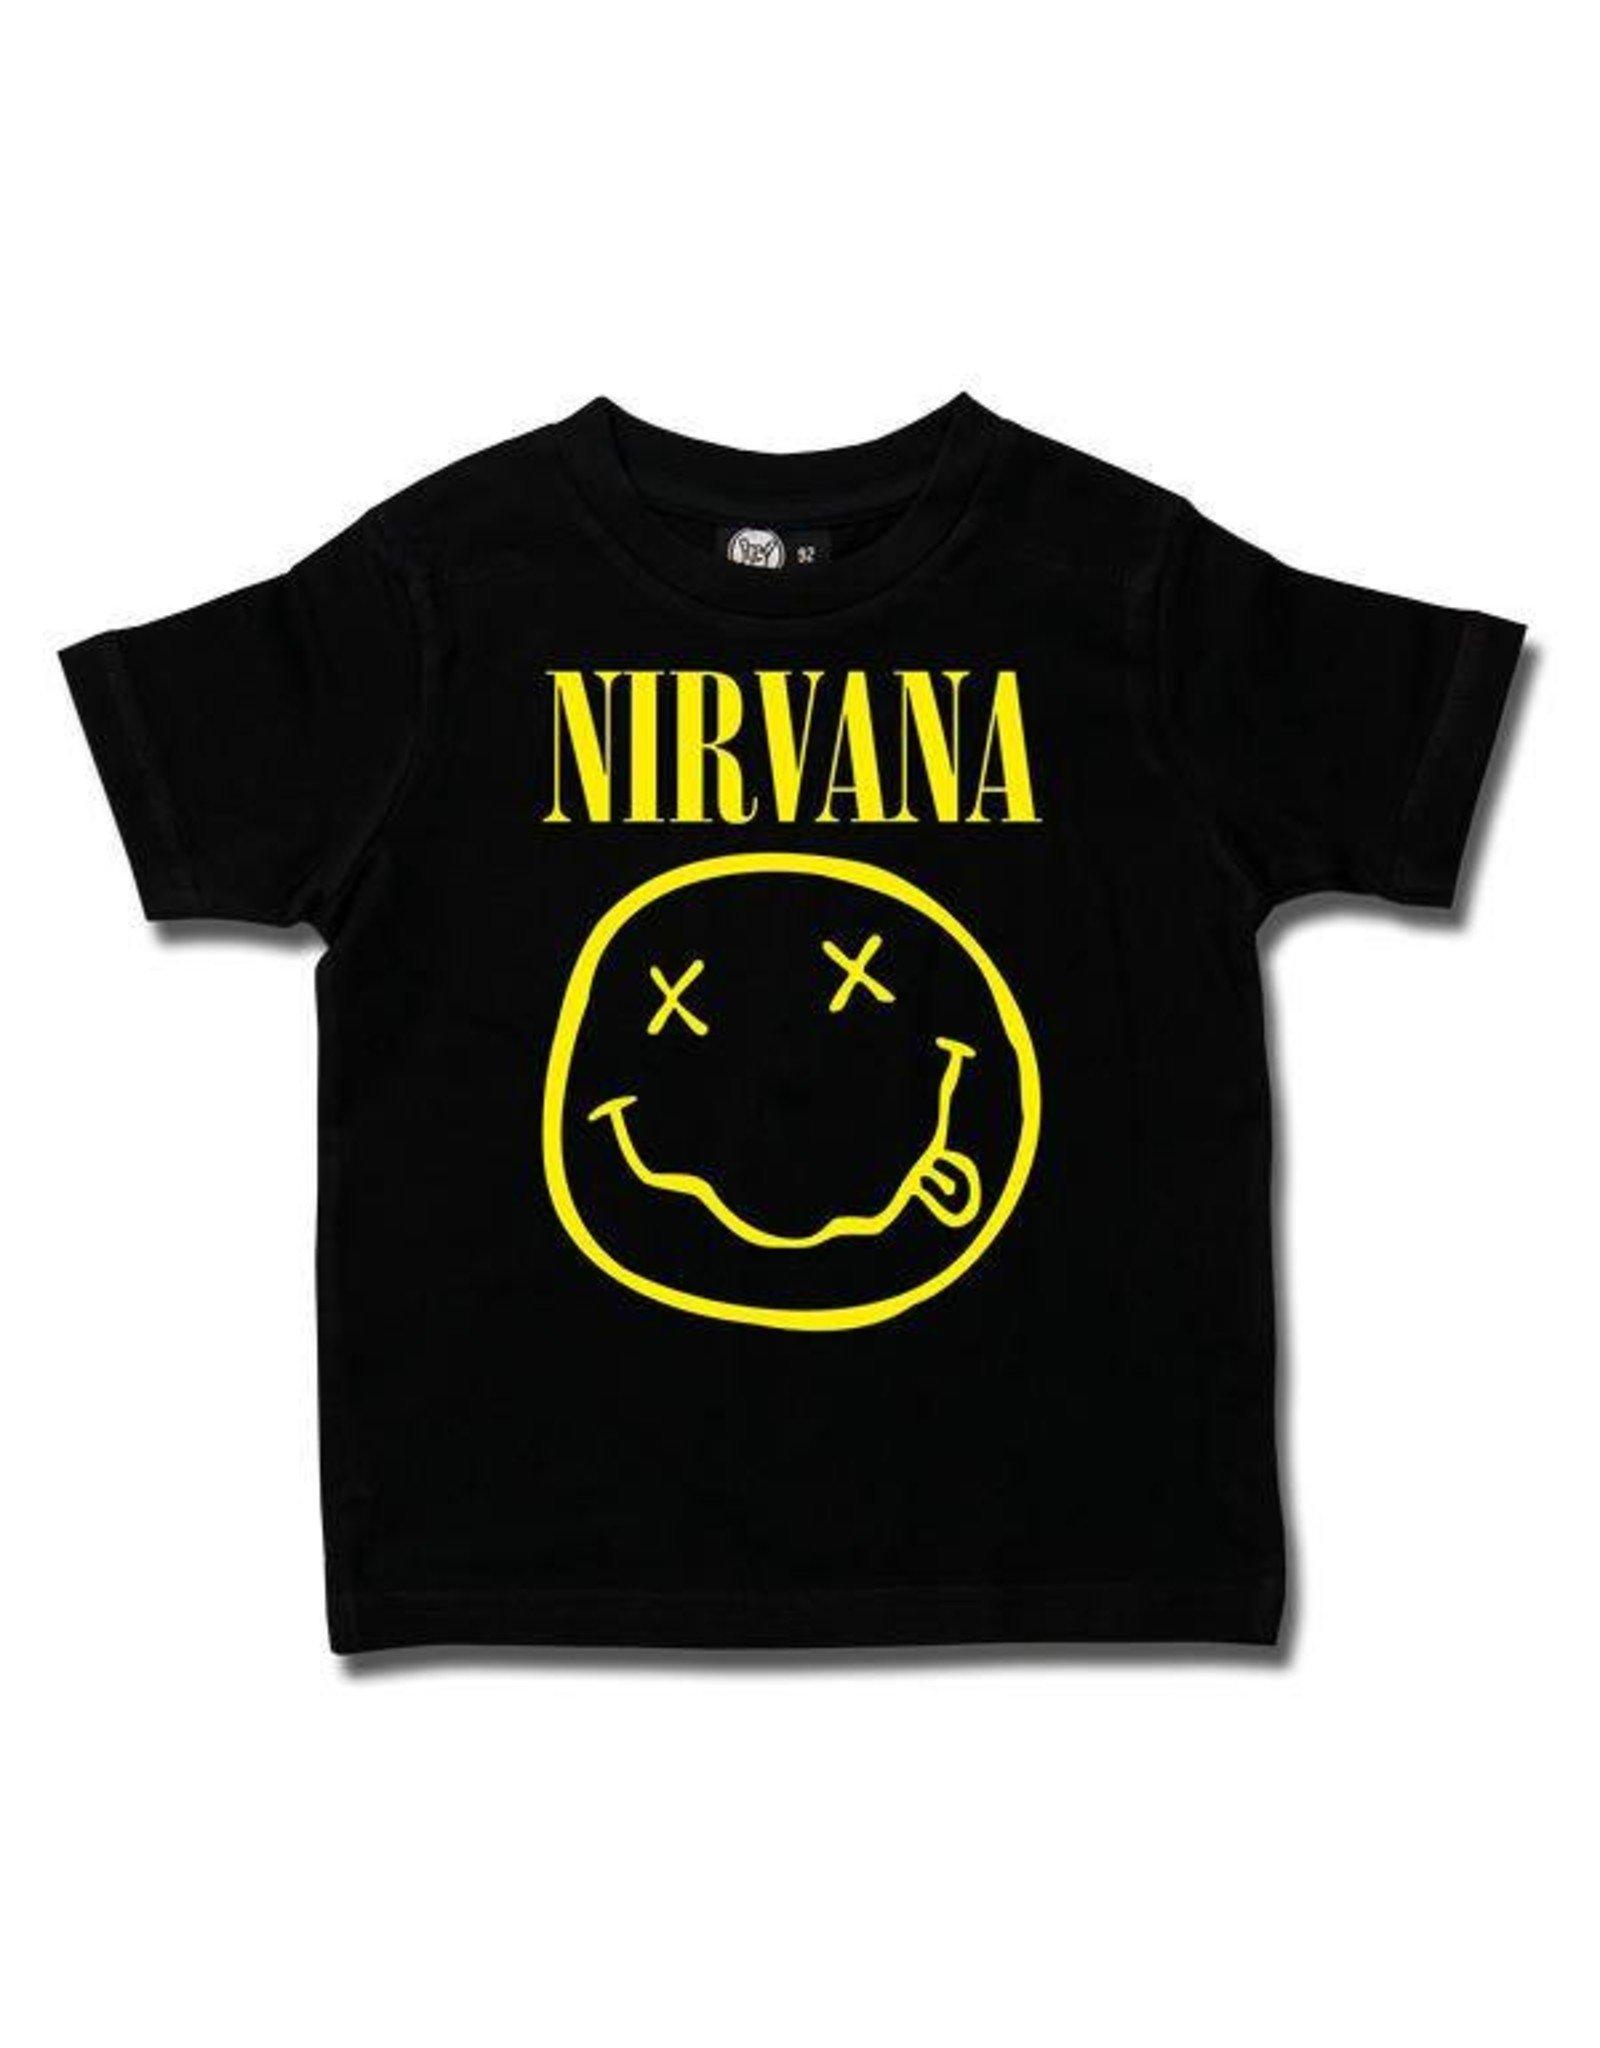 Nirvana (Smiley) Kids T-Shirt